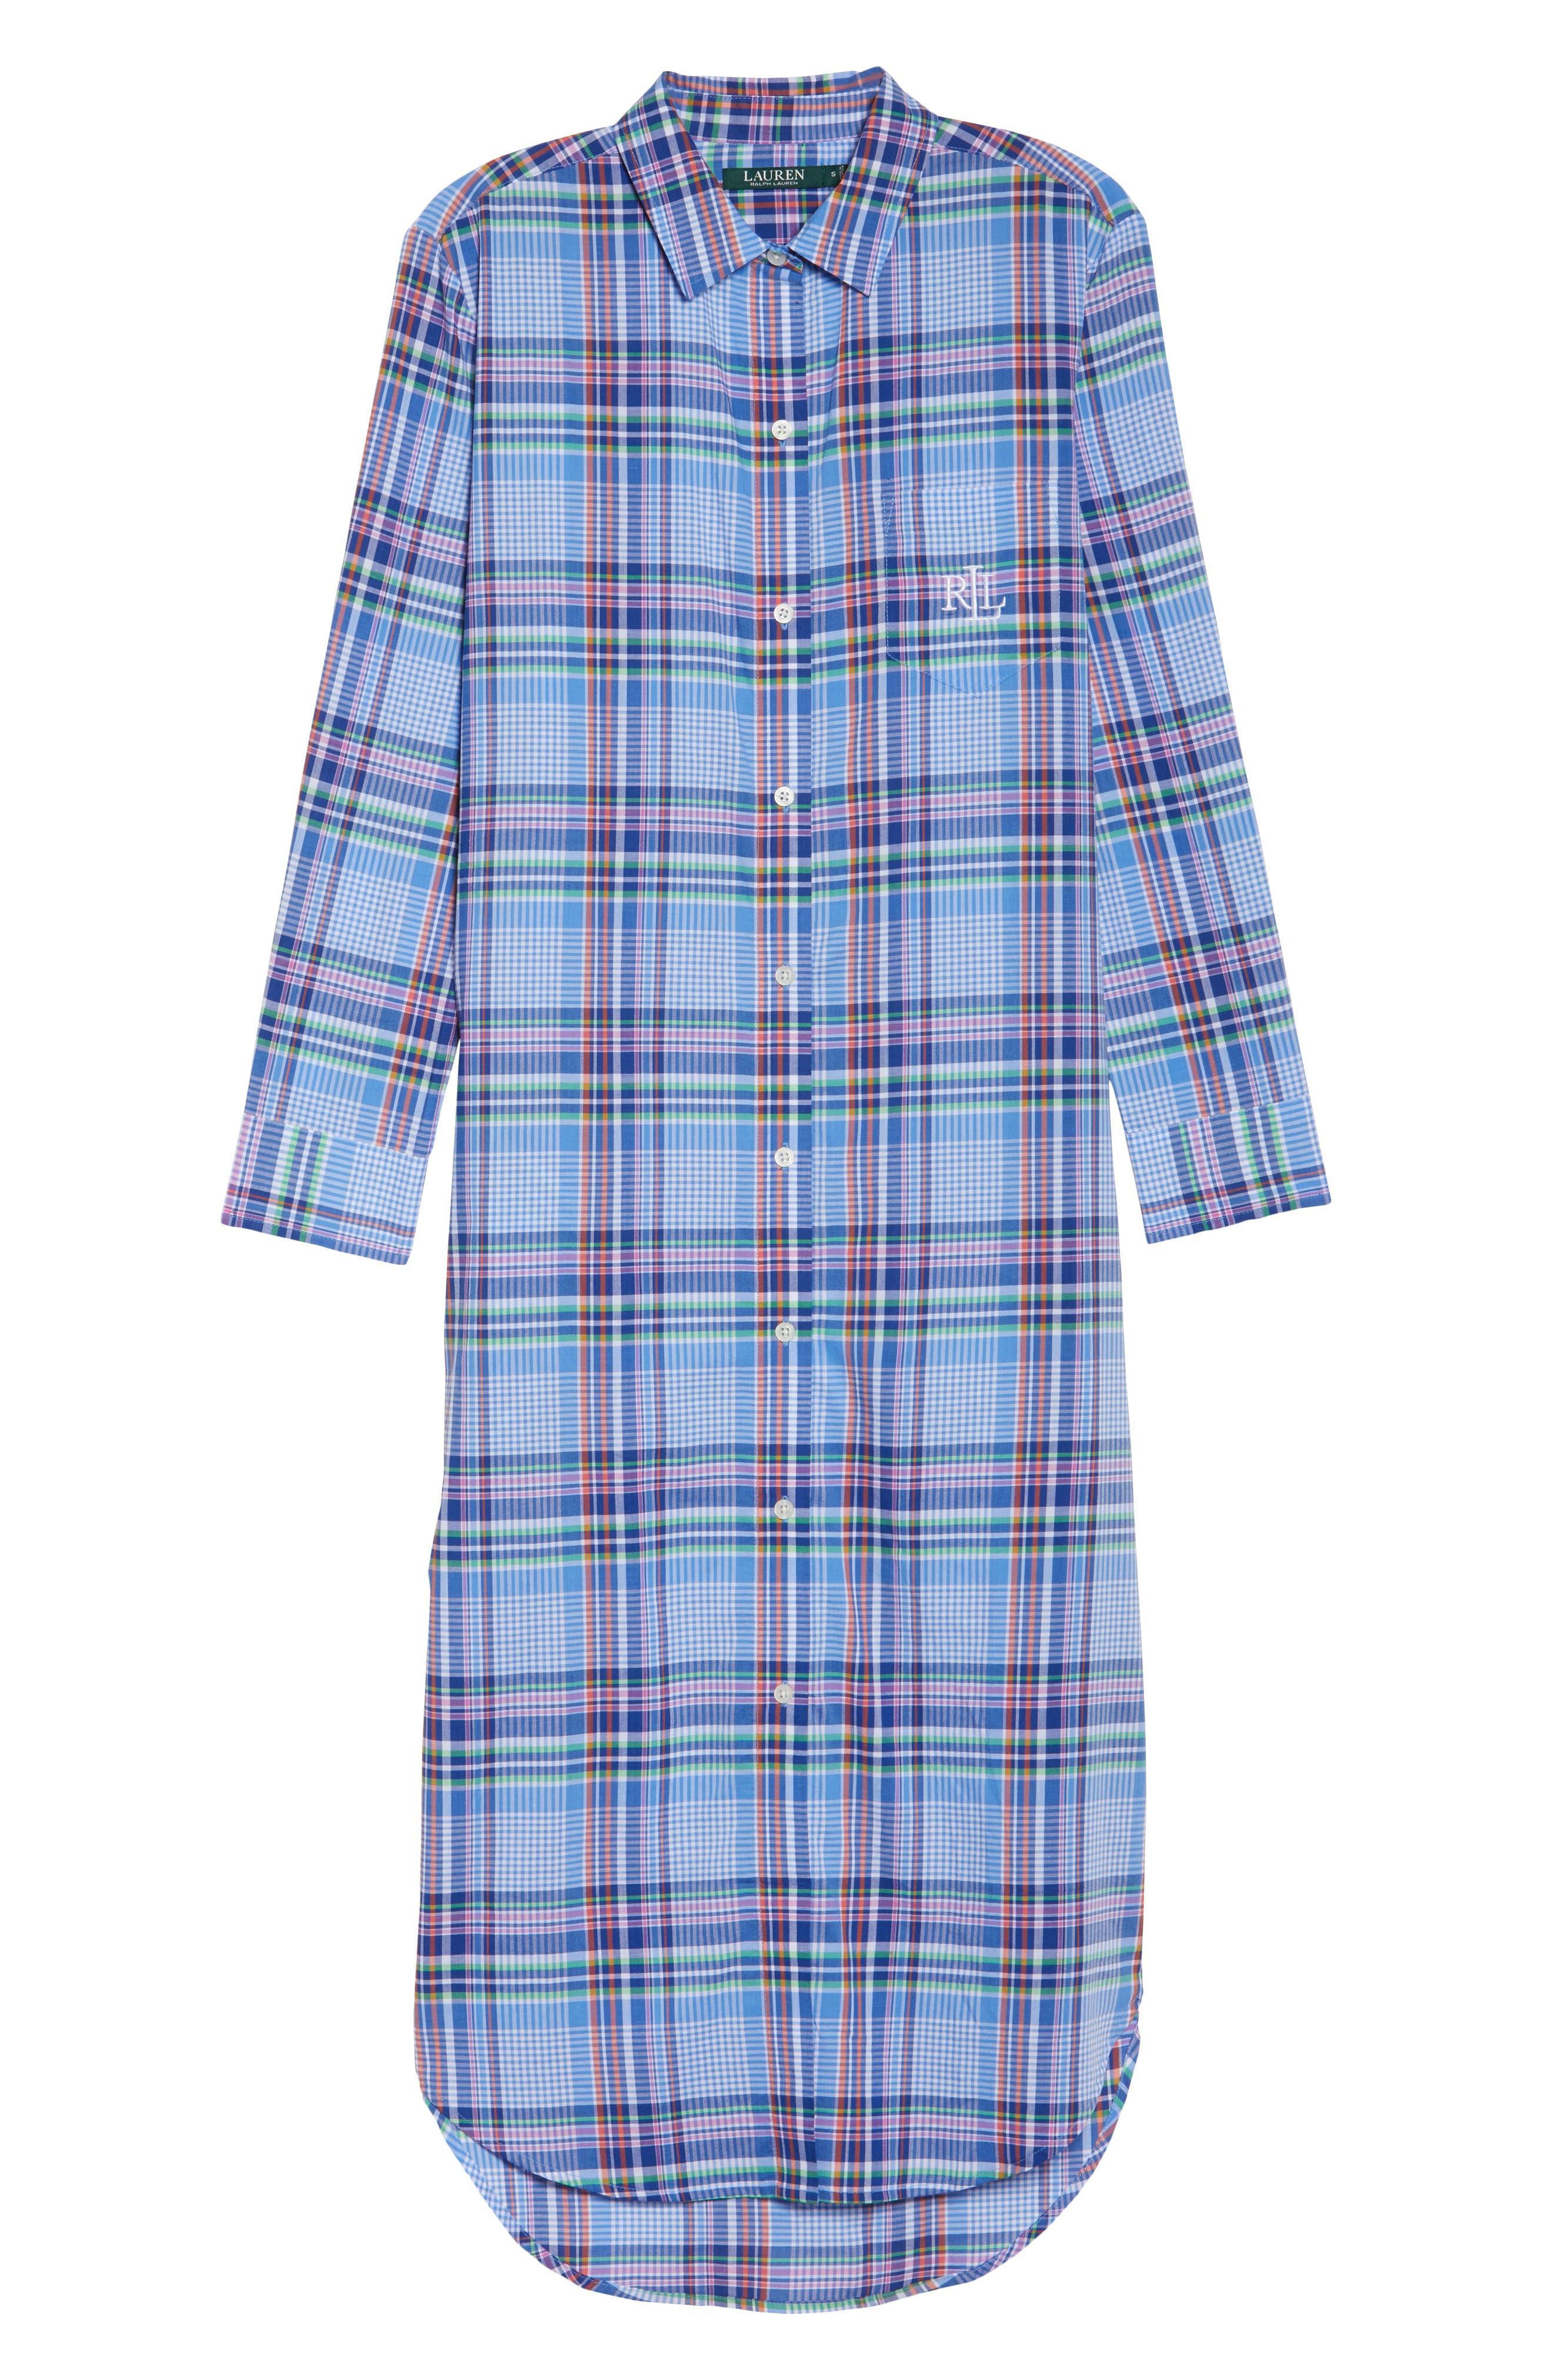 Ballet Plaid Sleep Shirt,                             Alternate thumbnail 4, color,                             Blue Plaid